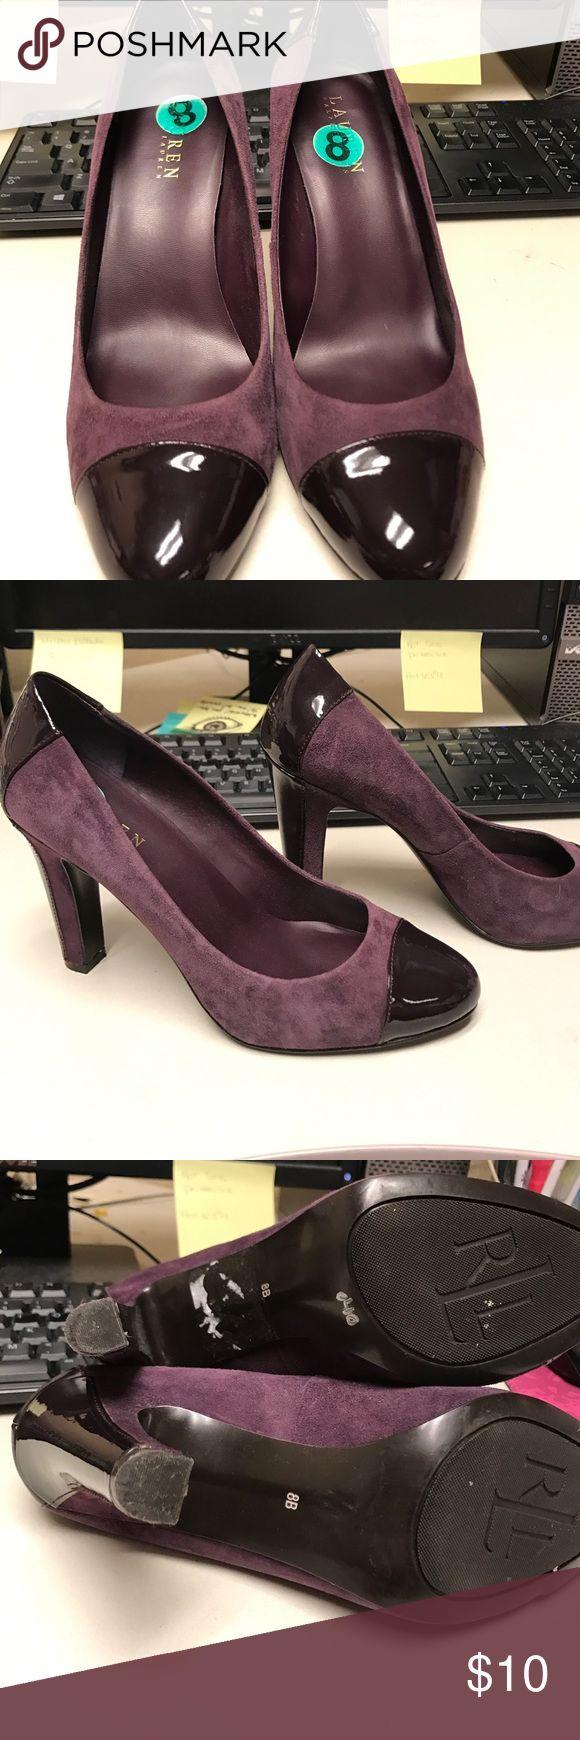 Ralph Lauren Purple heels size 8 Size 8 Purple Ralph Lauren heels , super cute shoes!!!!! About a 4 inch heel Lauren Ralph Lauren Shoes Heels